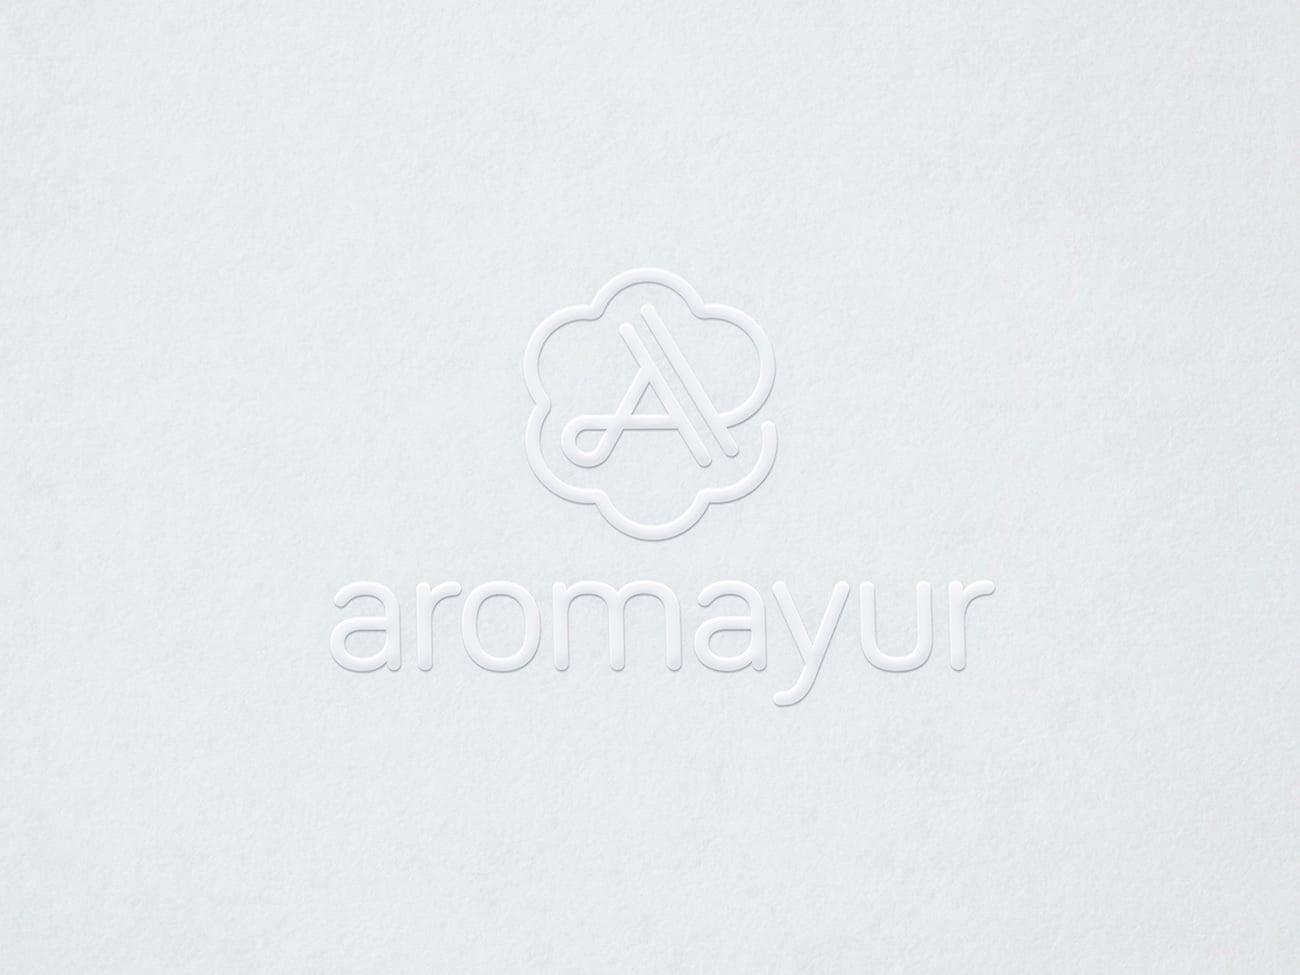 diseño packaging aromayur creatividad